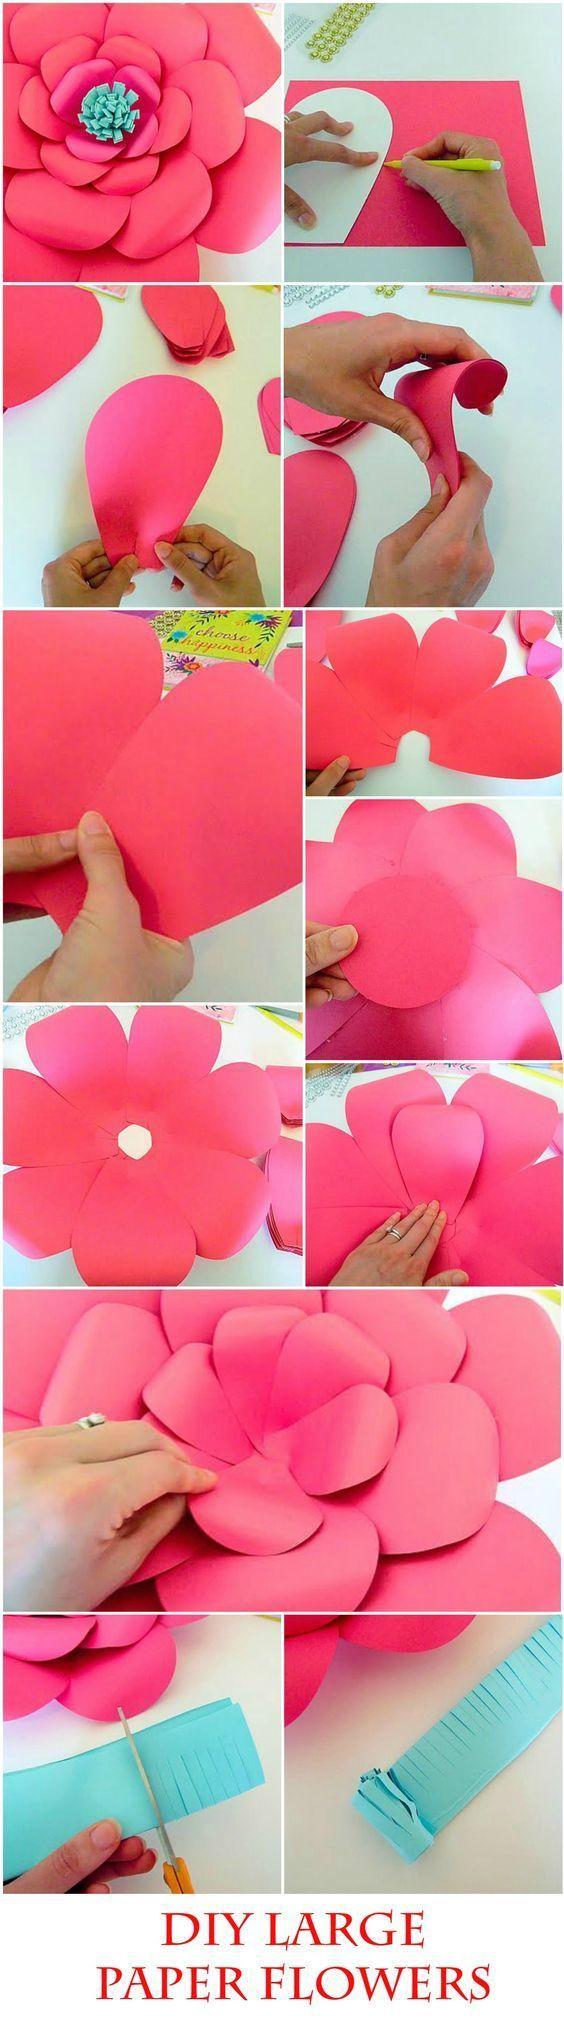 The ultimate list of handmade flower tutorials 37 inspiring diy giant paper flower templates tutorial diy paper flower making kit svg paper mightylinksfo